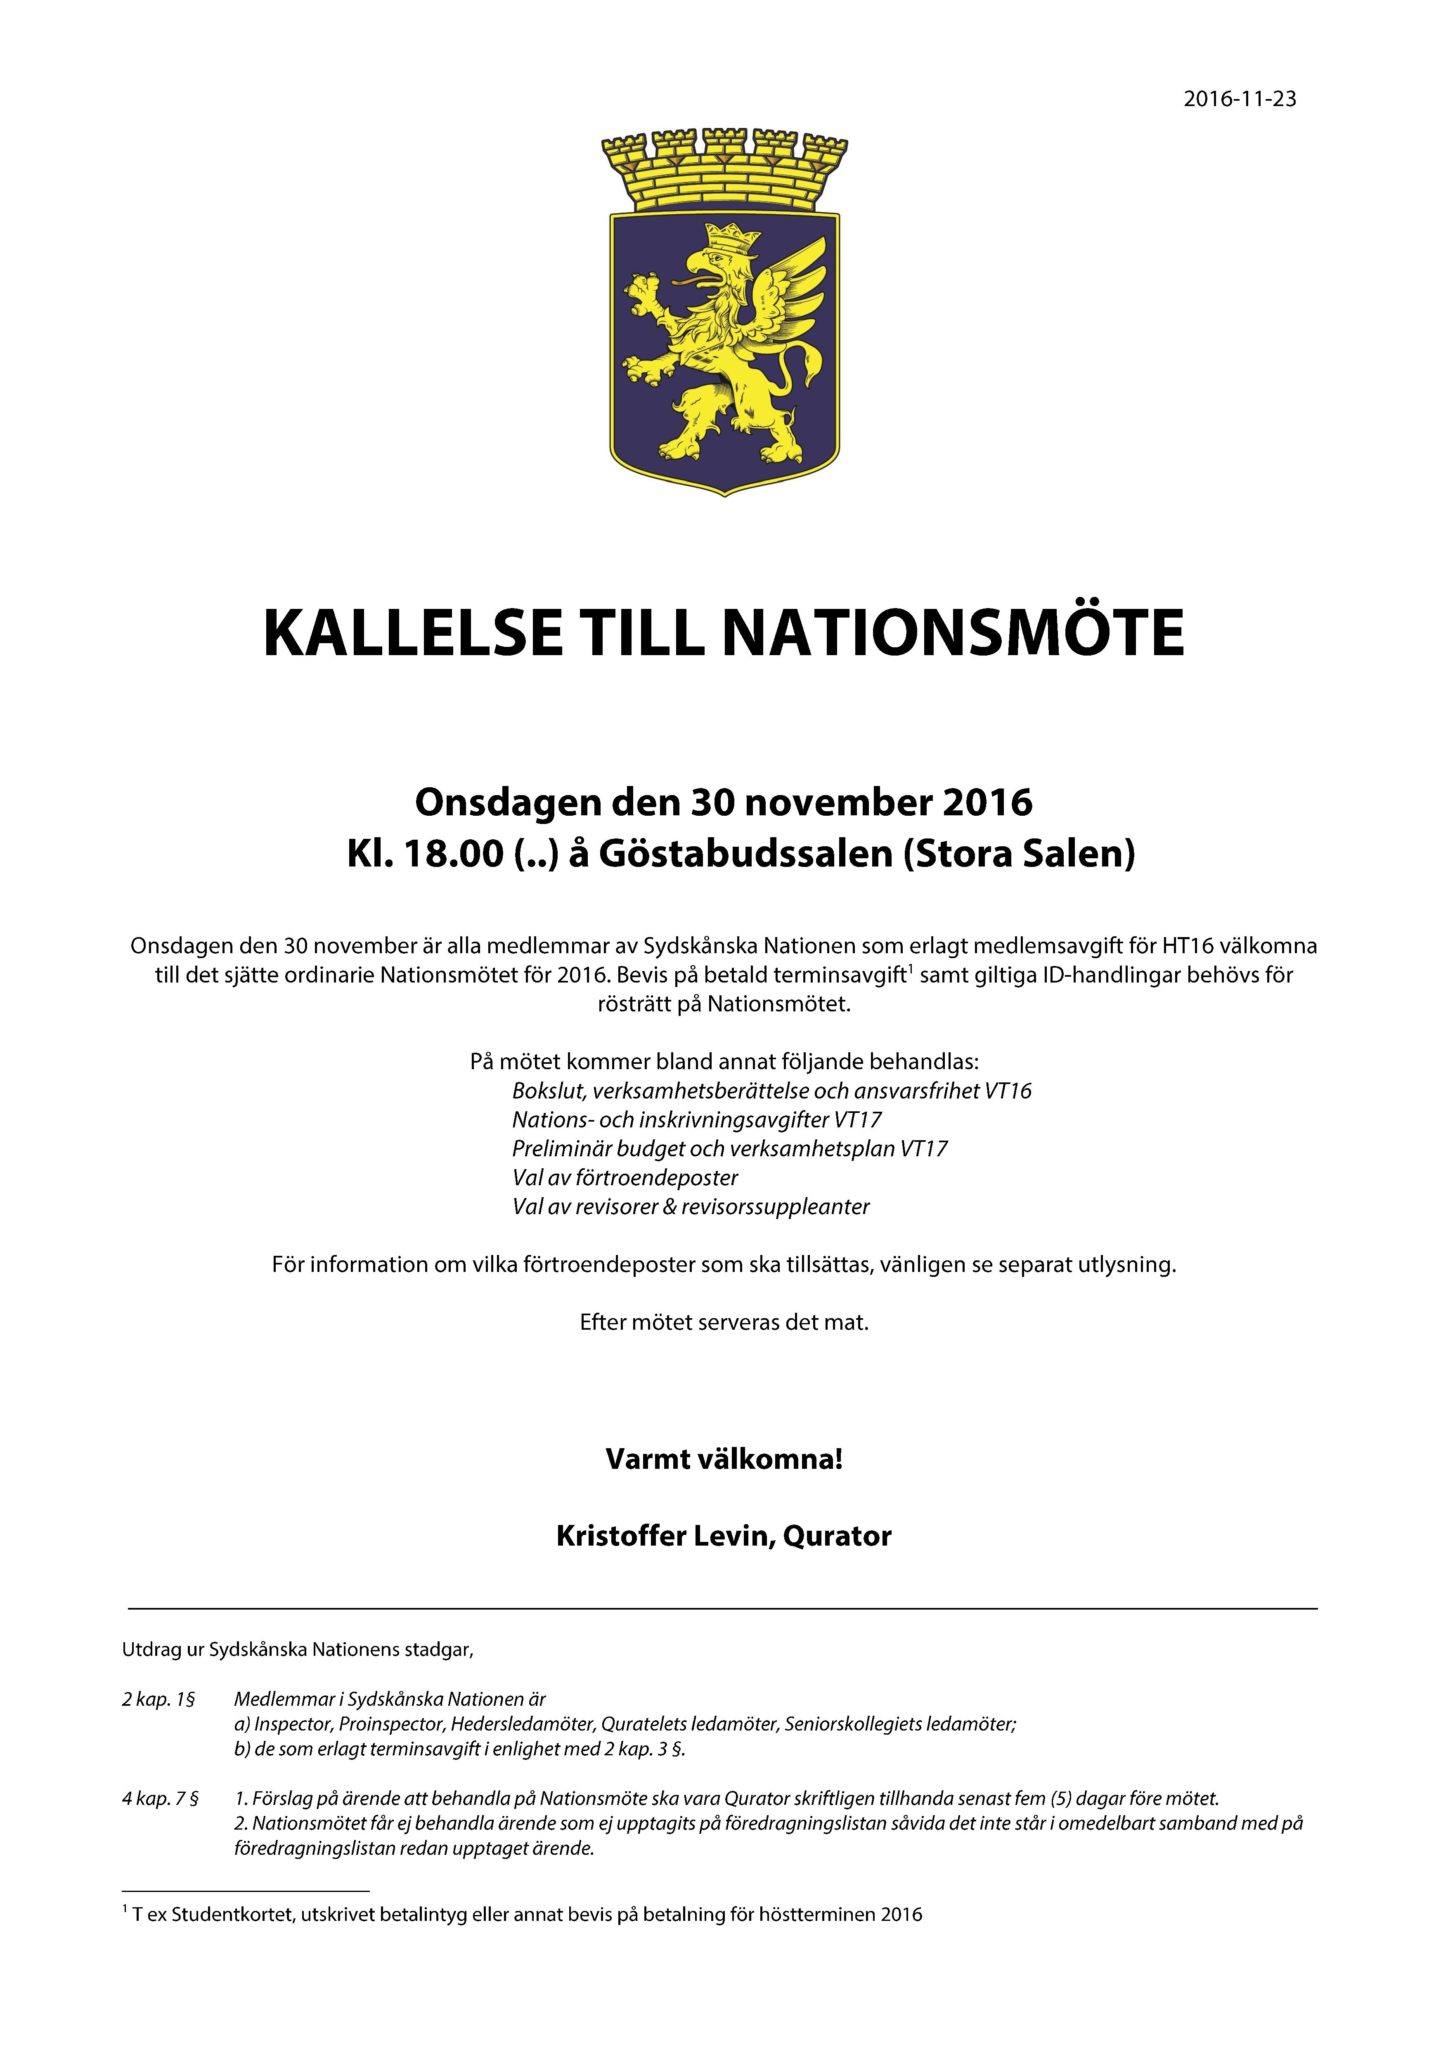 kallelse-till-nationsmote-2016-05-11